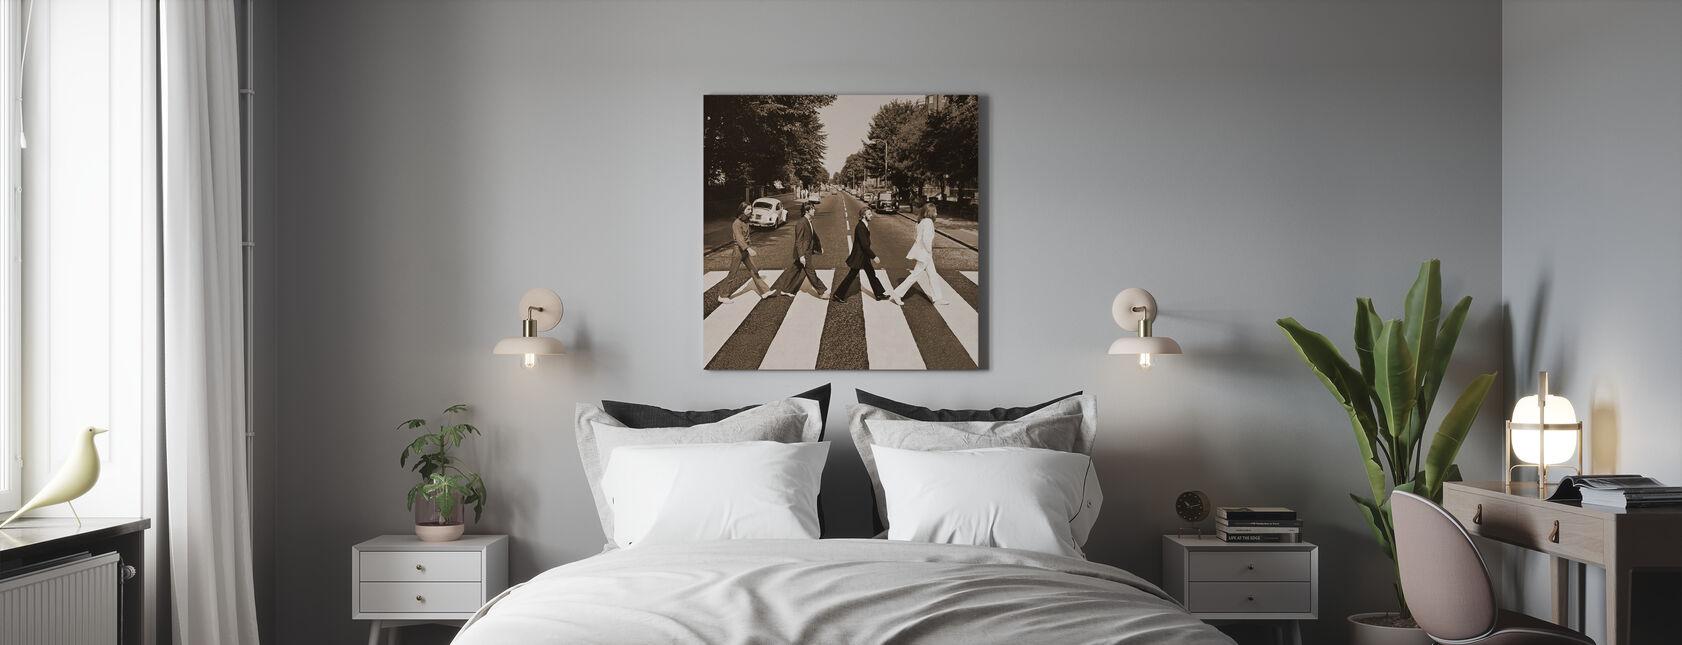 Beatles - Klostervägen Sepia - Canvastavla - Sovrum